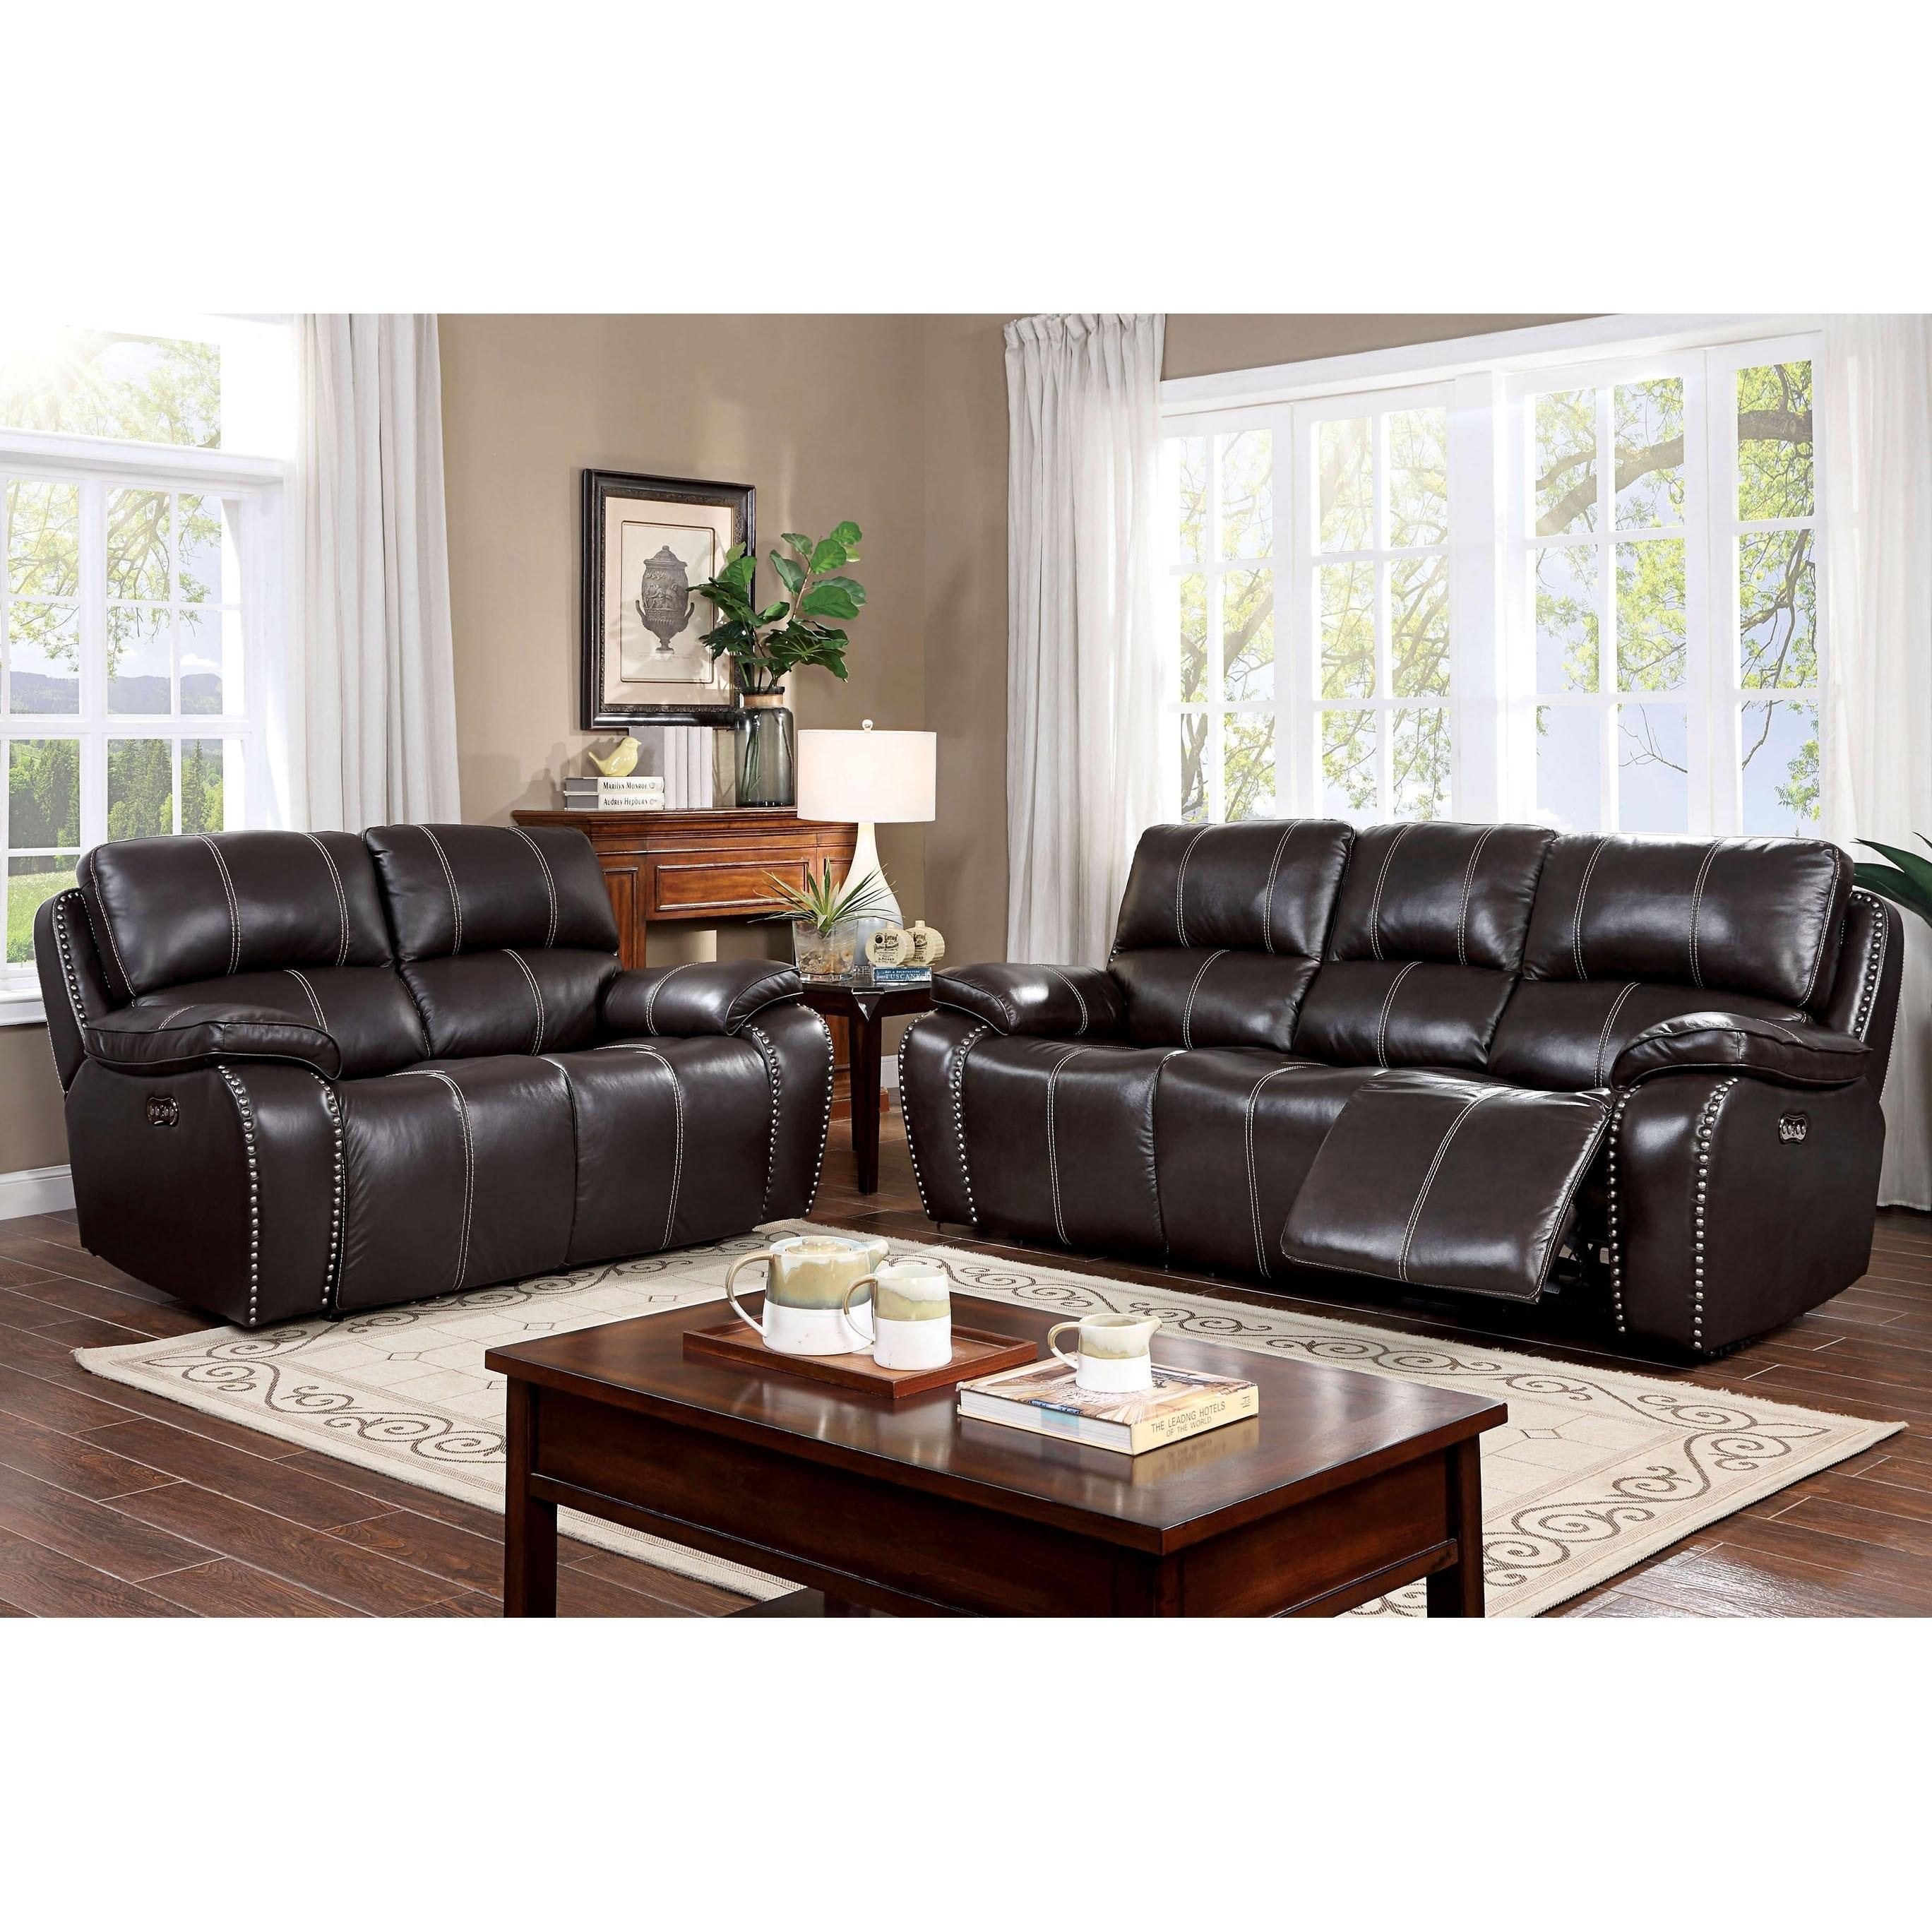 Furniture Of America Pika Brown 2 Piece Reclining Sofa Set Overstock 29726668